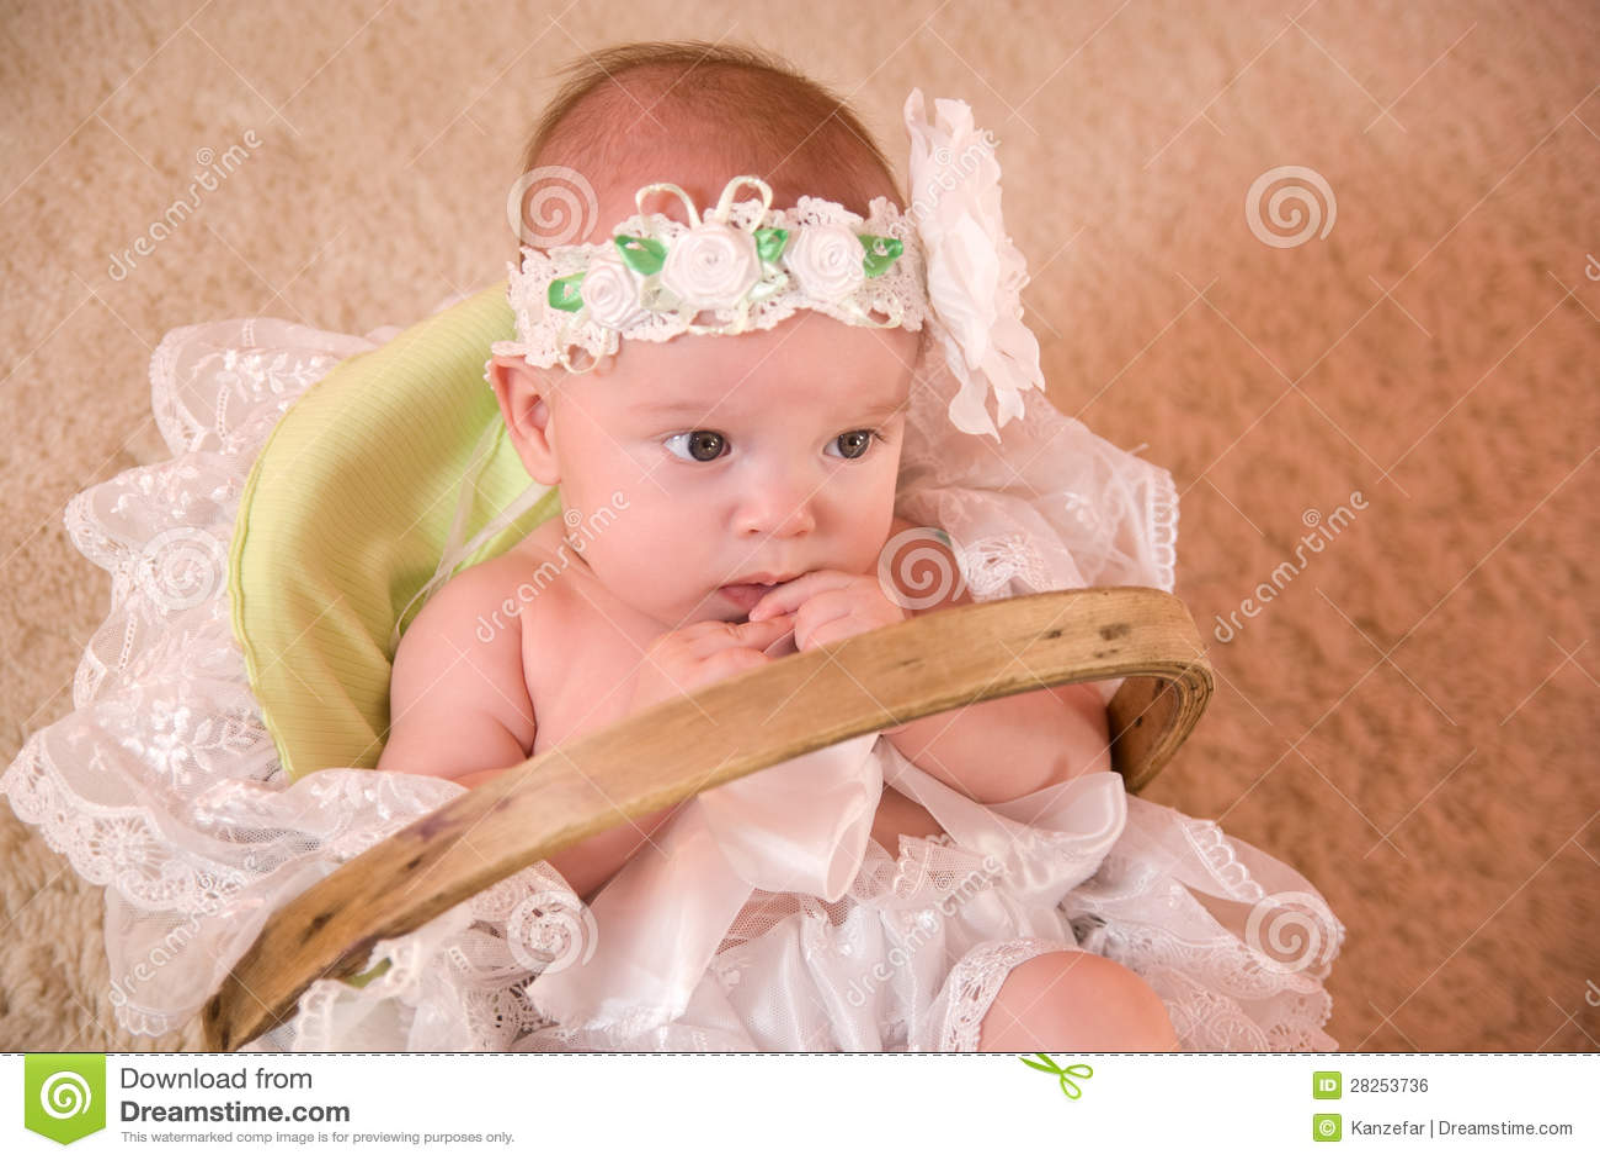 A Beautiful Baby Girl Stock Photo. Image Of Girl, Portrait